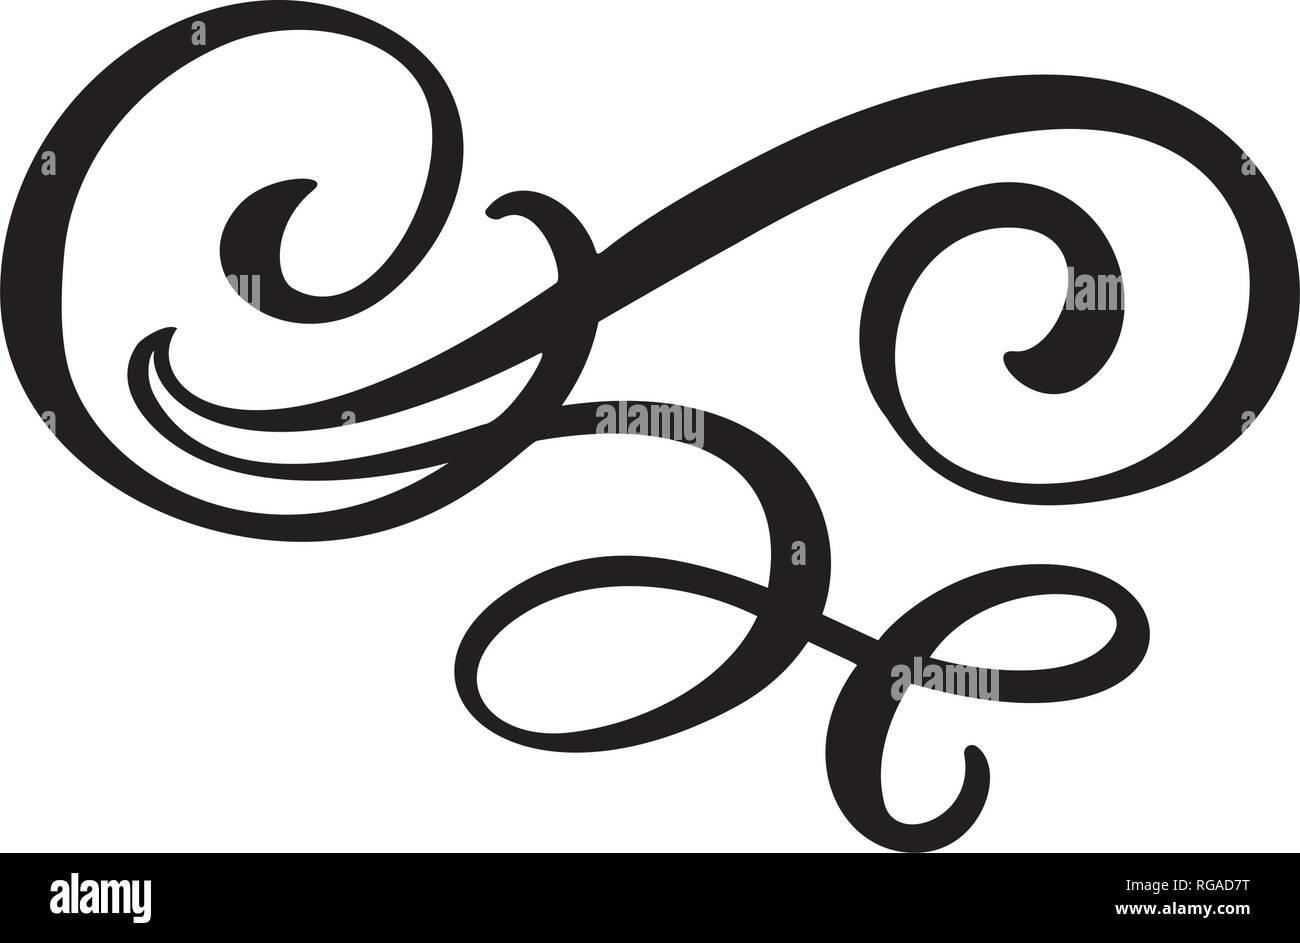 Floral lines filigree design elements. Vector vintage line elegant dividers and separators, swirls and corners decorative ornaments. Flourish curl - Stock Image